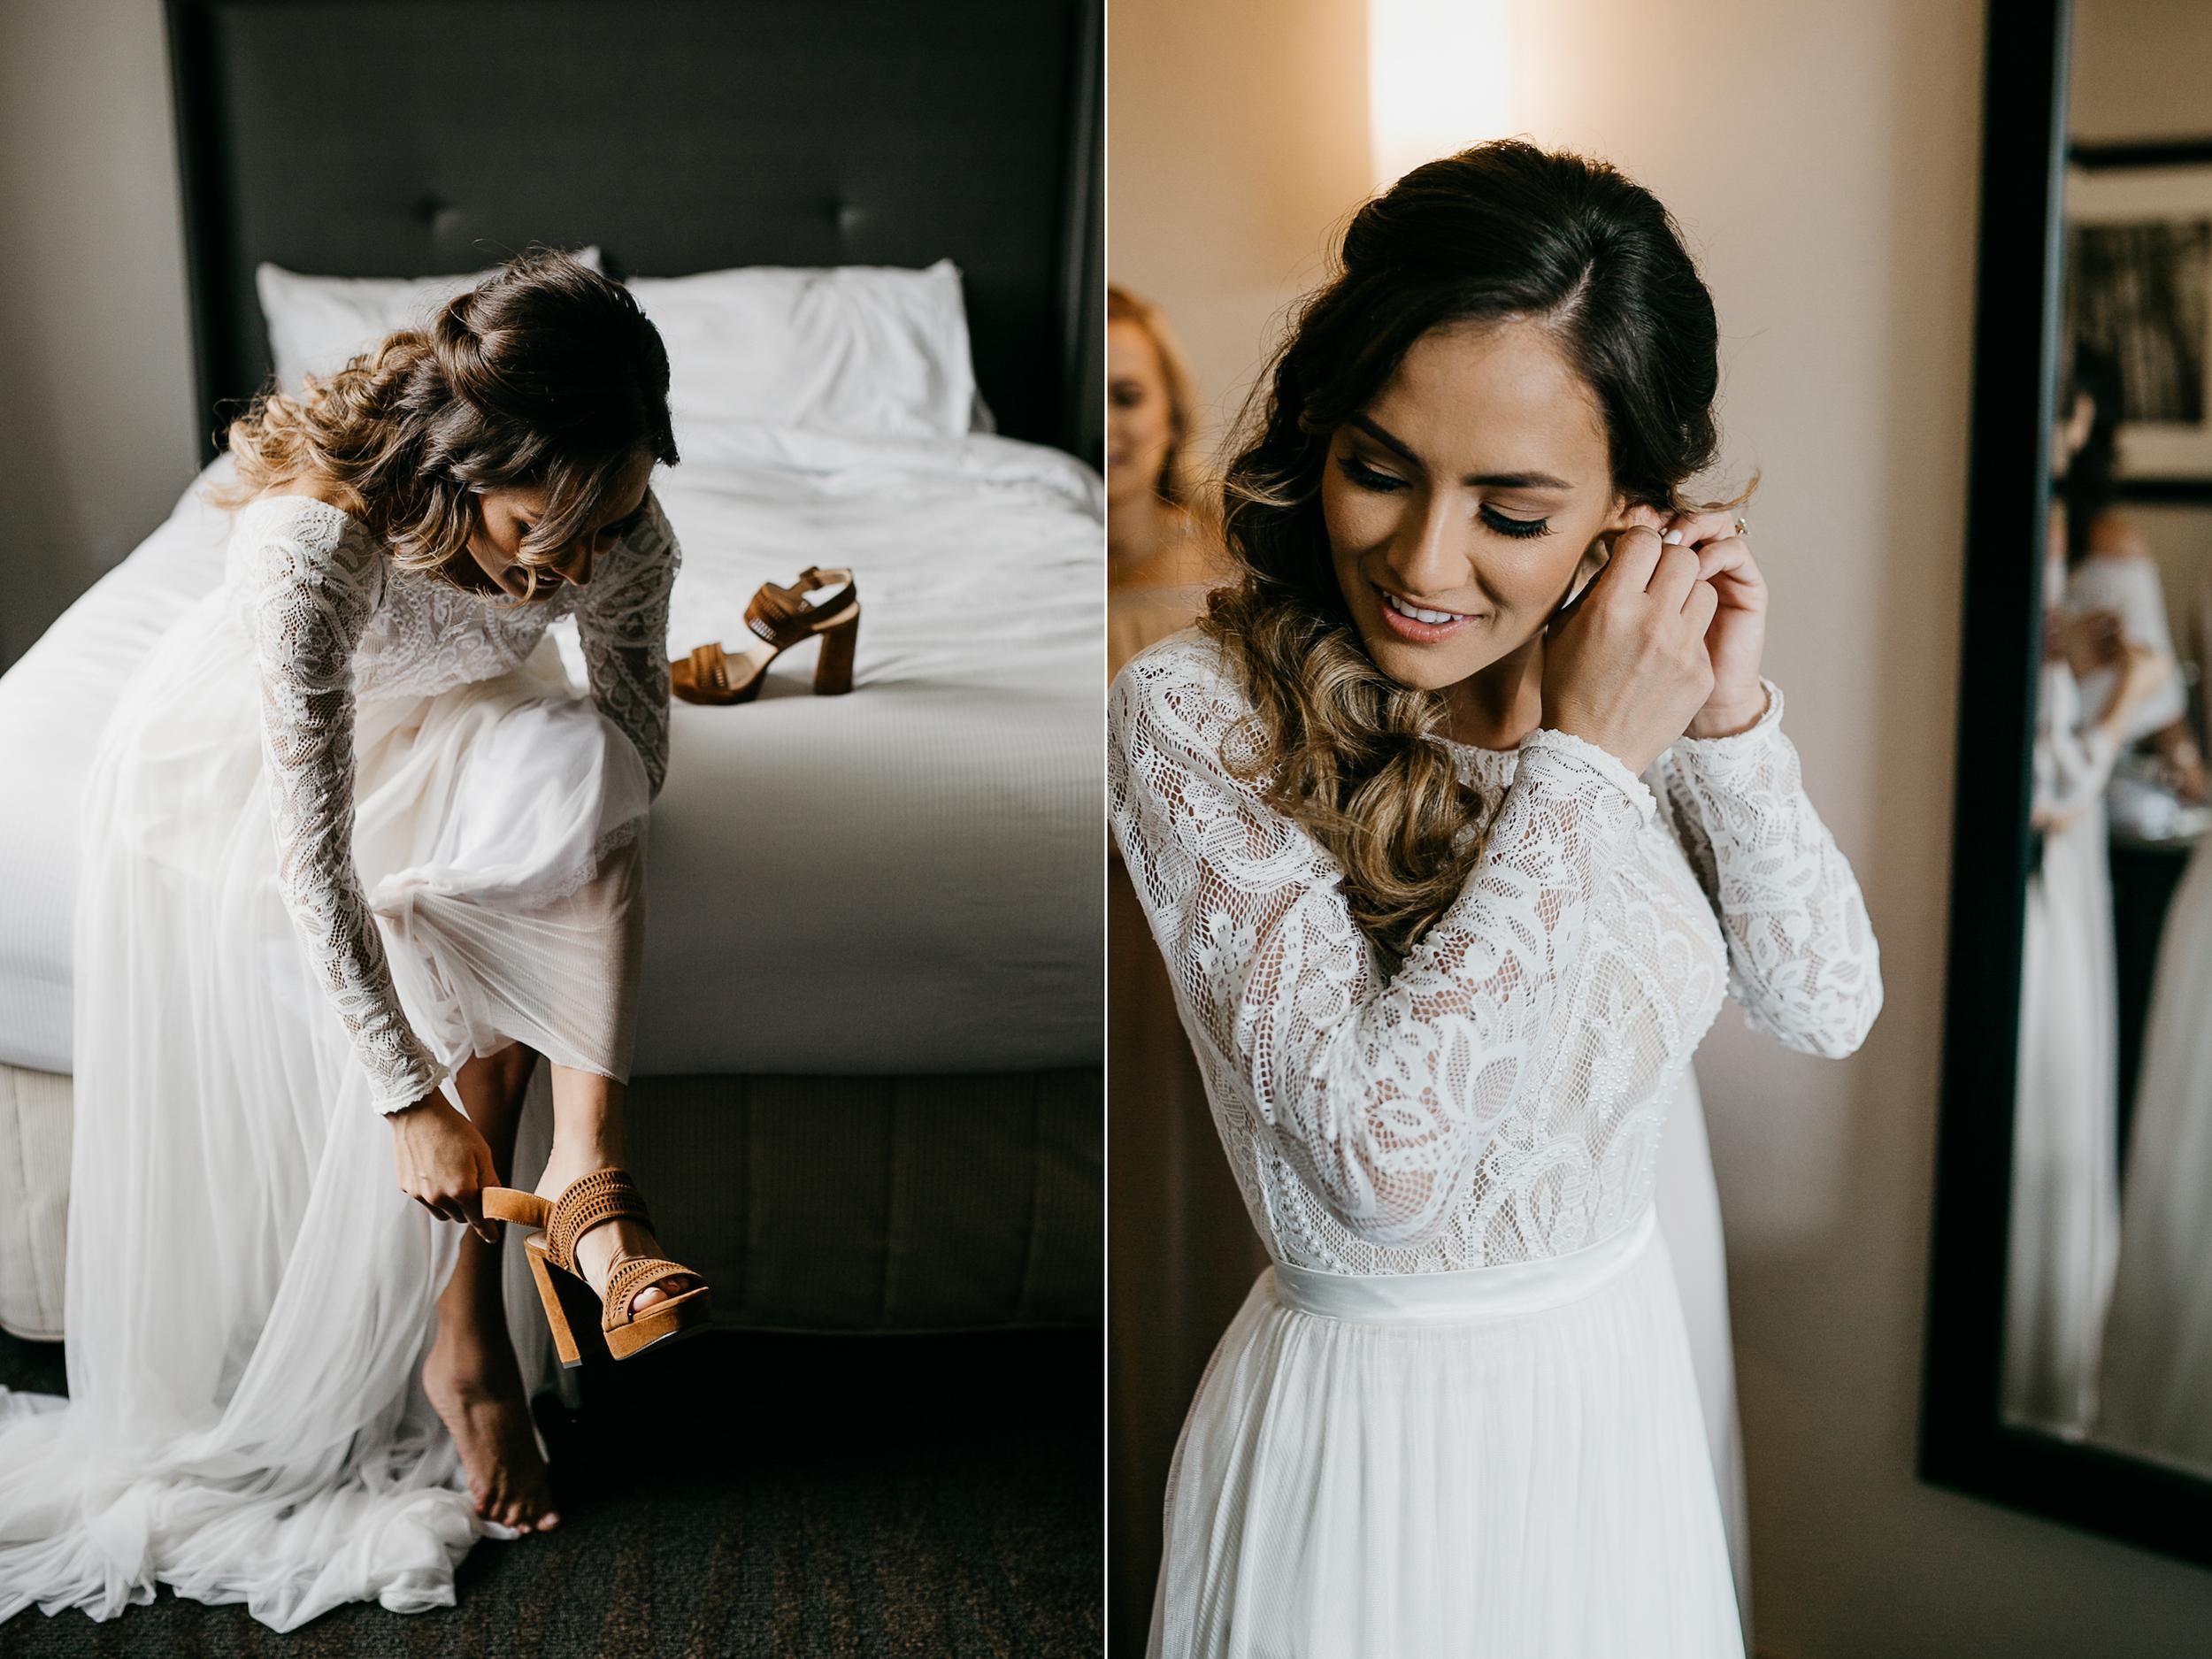 camp campbell-wedding-photographer02-1.jpg